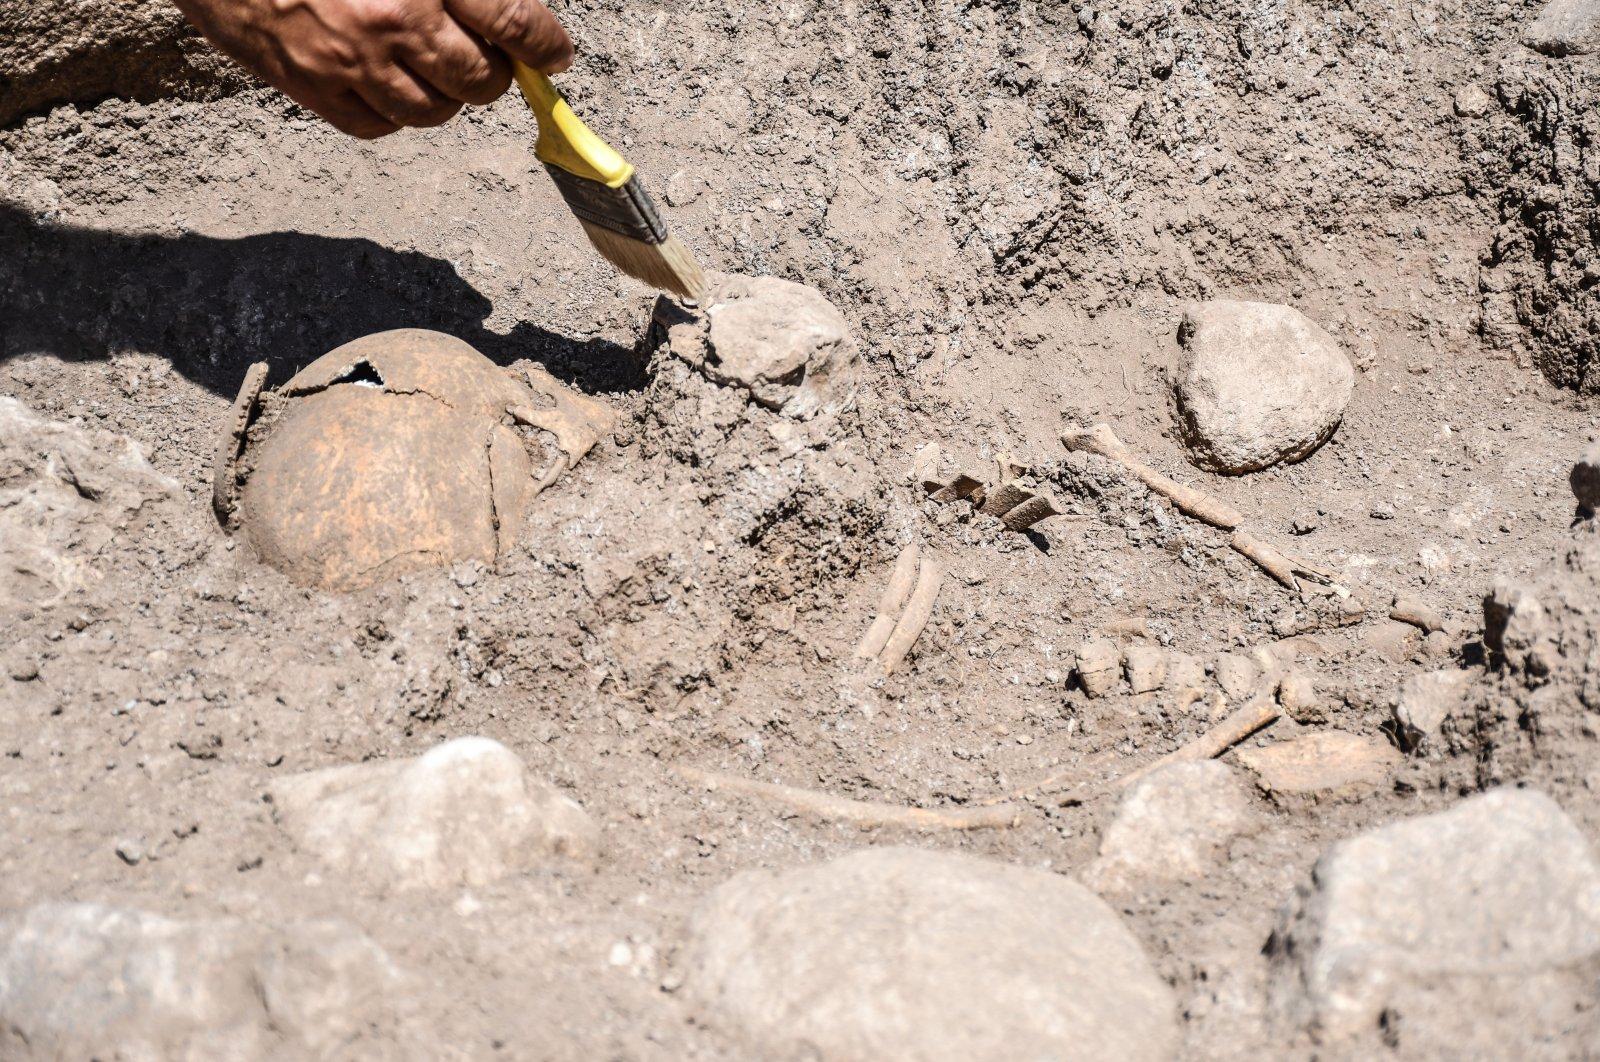 An archaeologist works on the skeleton of a child at Domuztepe Mound, Kahramanmaraş, southern Turkey, Sept. 20, 2021. (AA Photo)